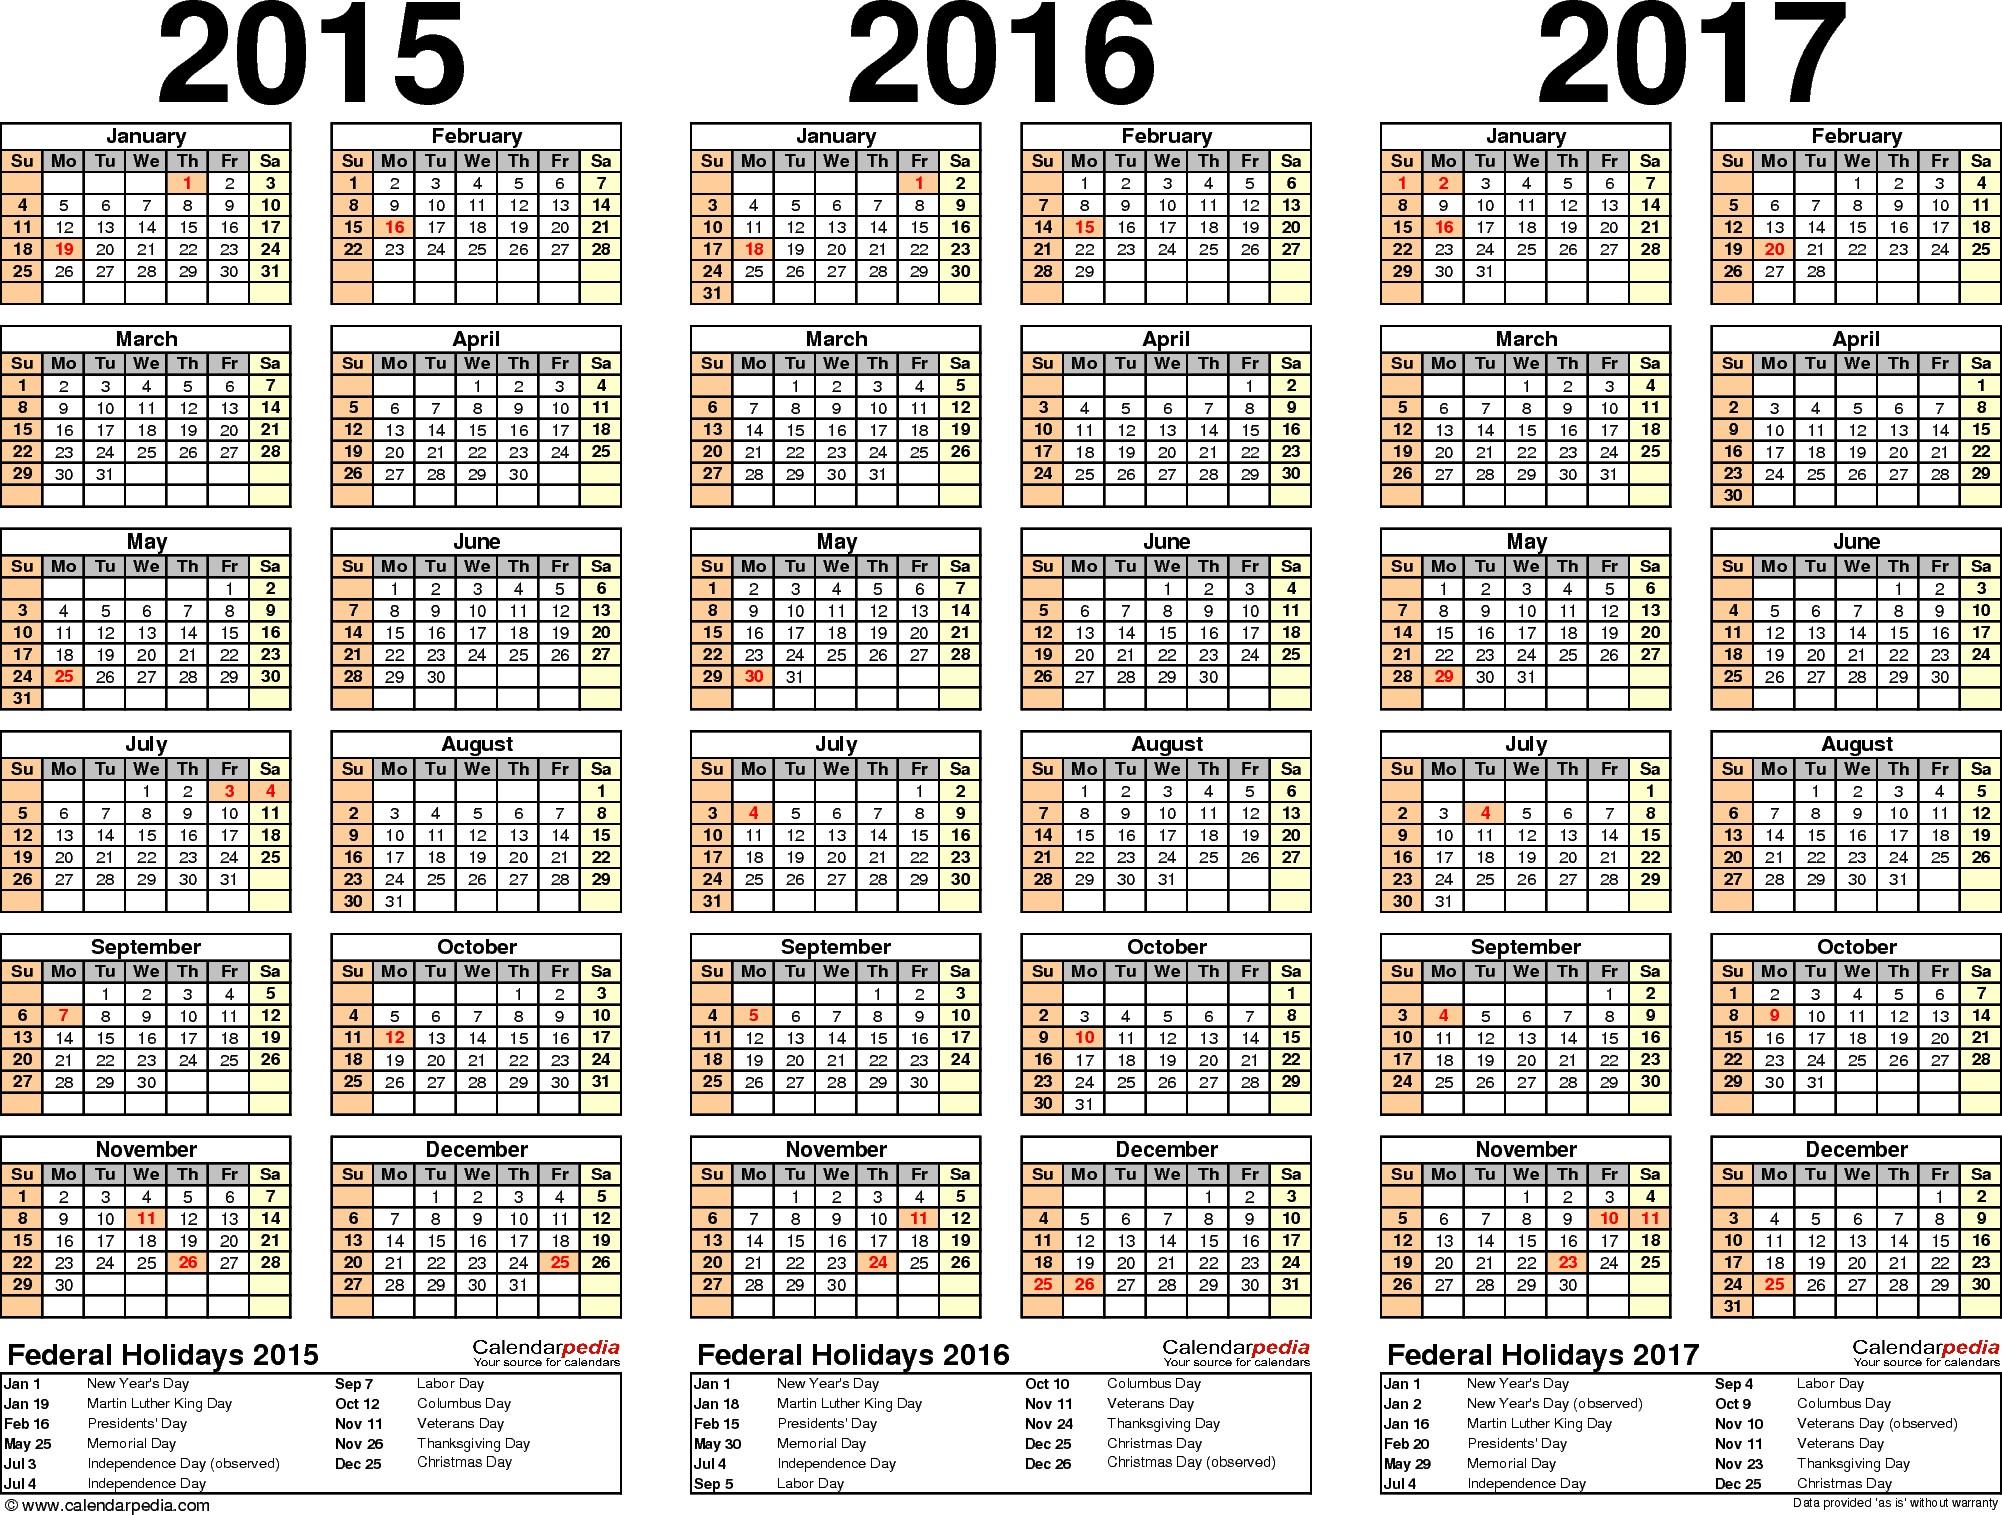 January 2019 Calendar Planner Actual 2015 2016 2017 Calendar 4 Three Year Printable Pdf Calendars Of January 2019 Calendar Planner Más Actual 10 Stylish Free Printable Calendars for 2019